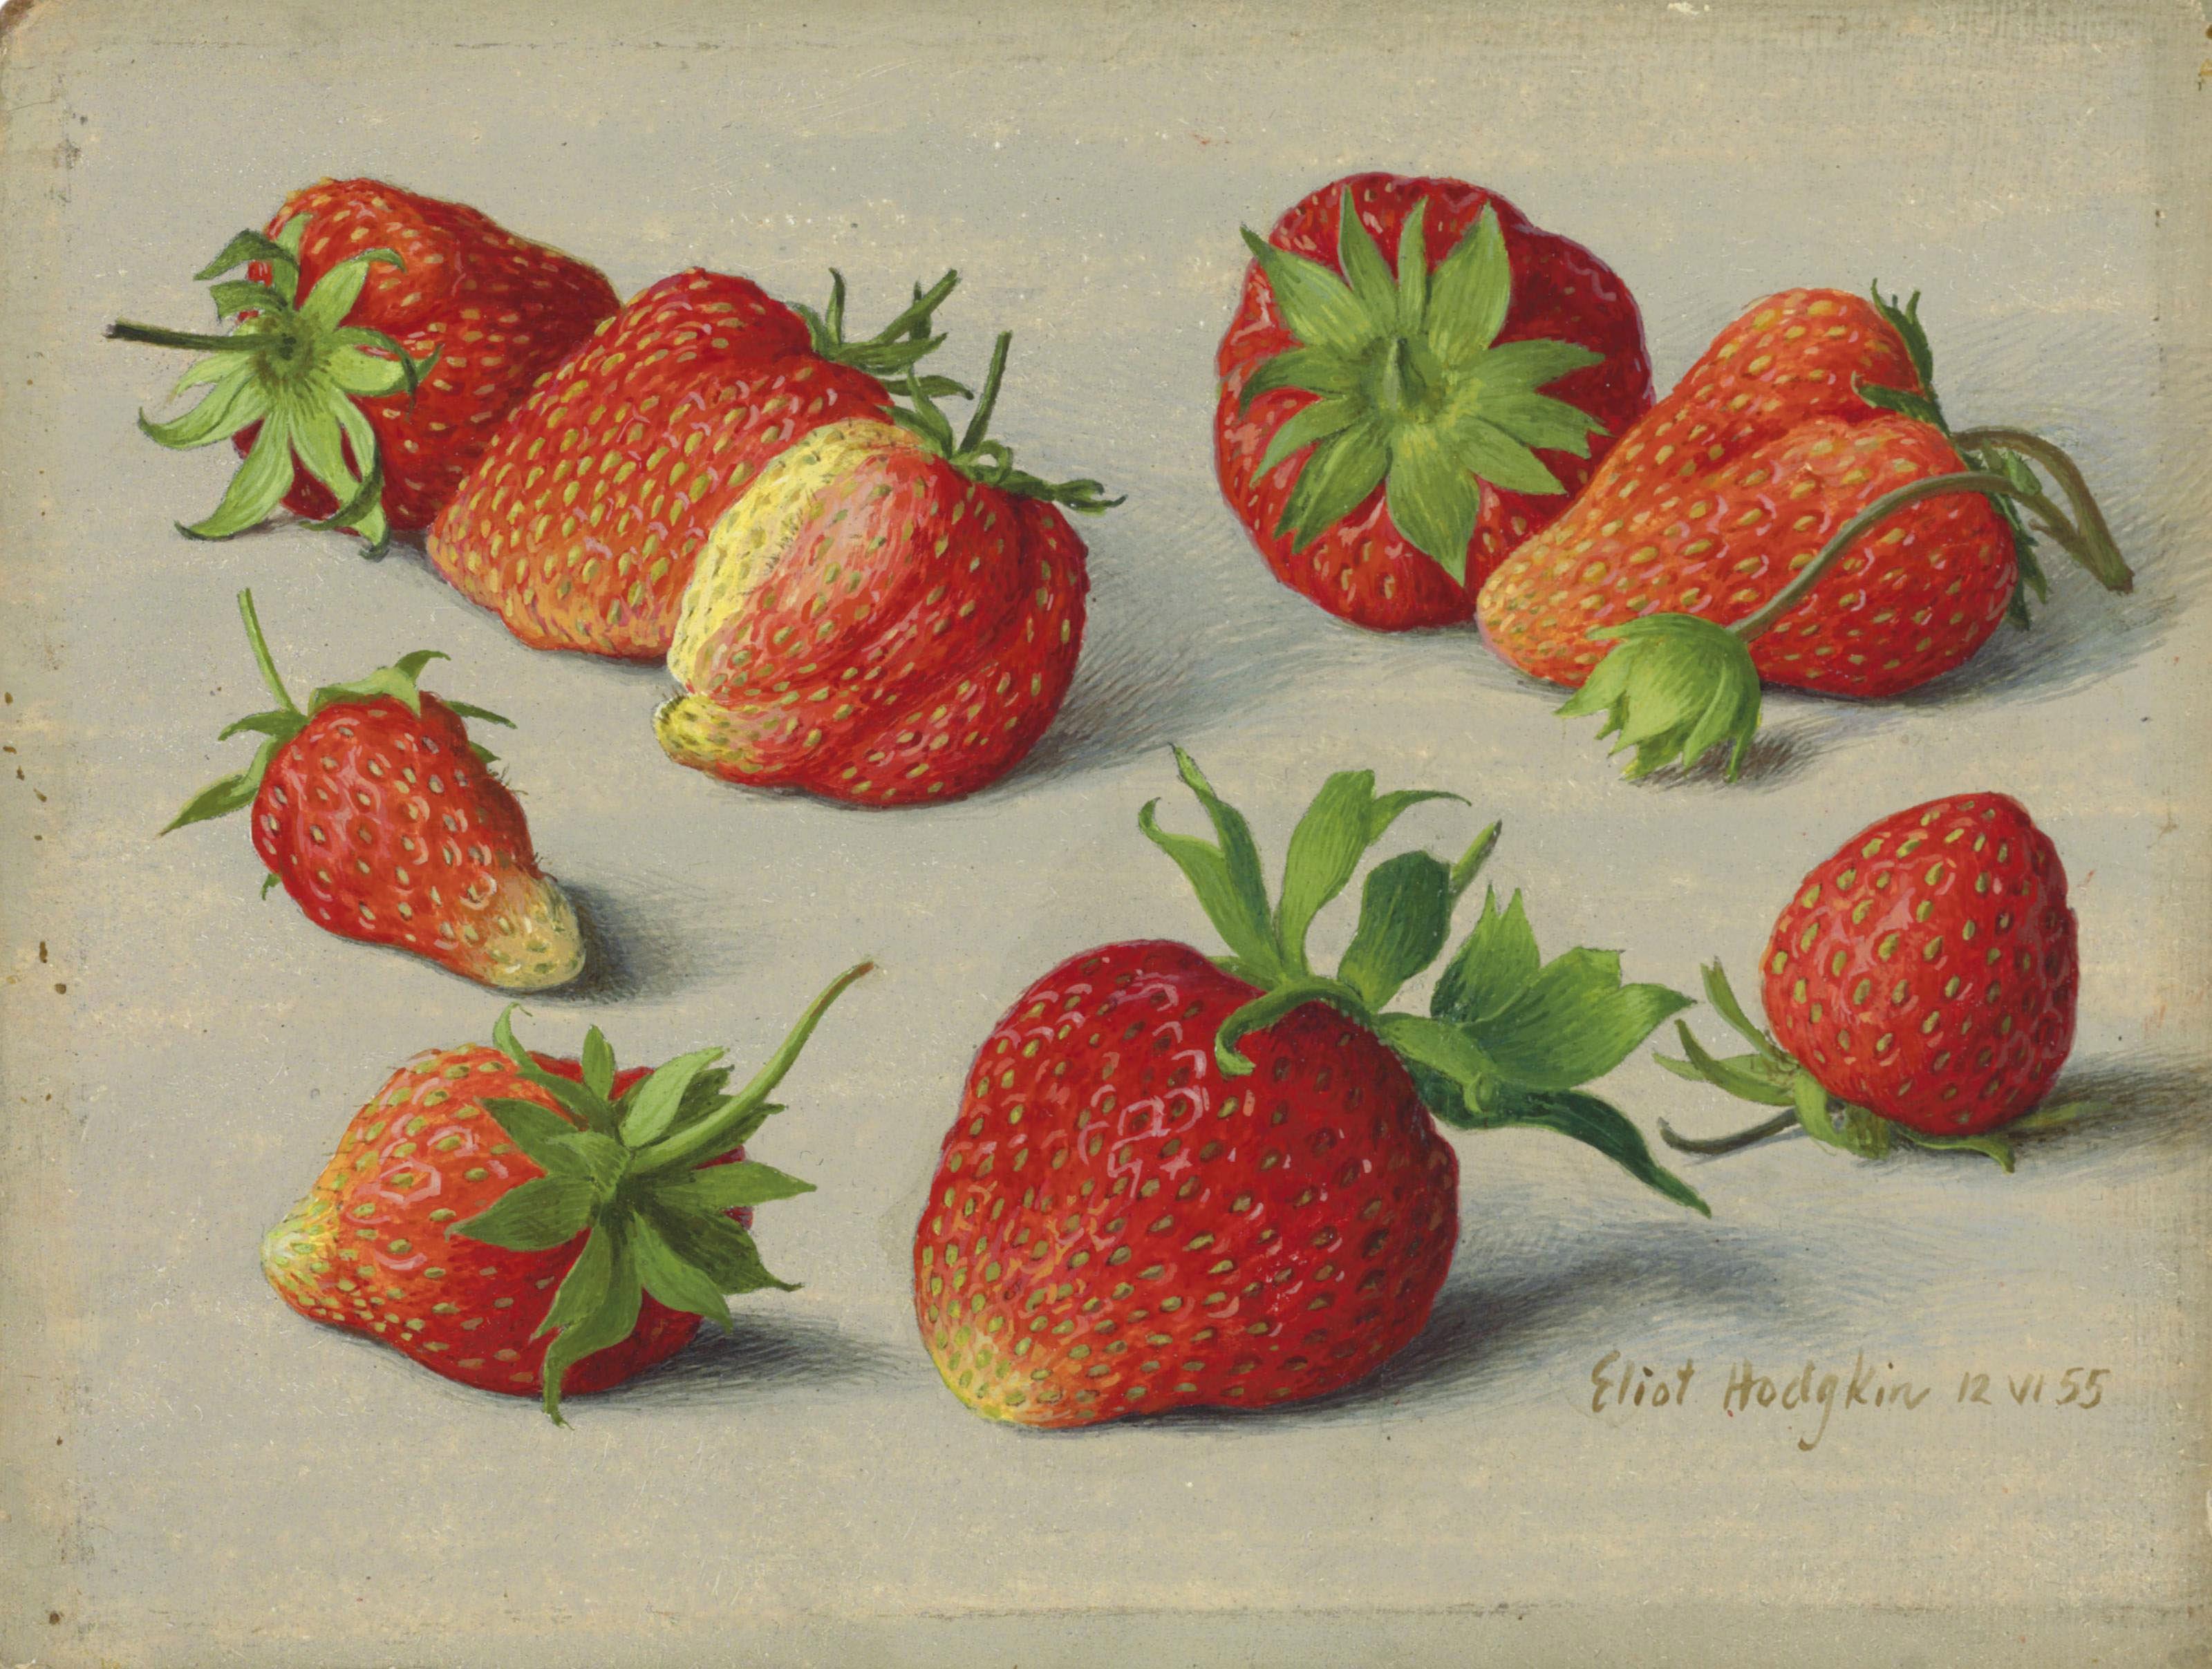 Nine strawberries